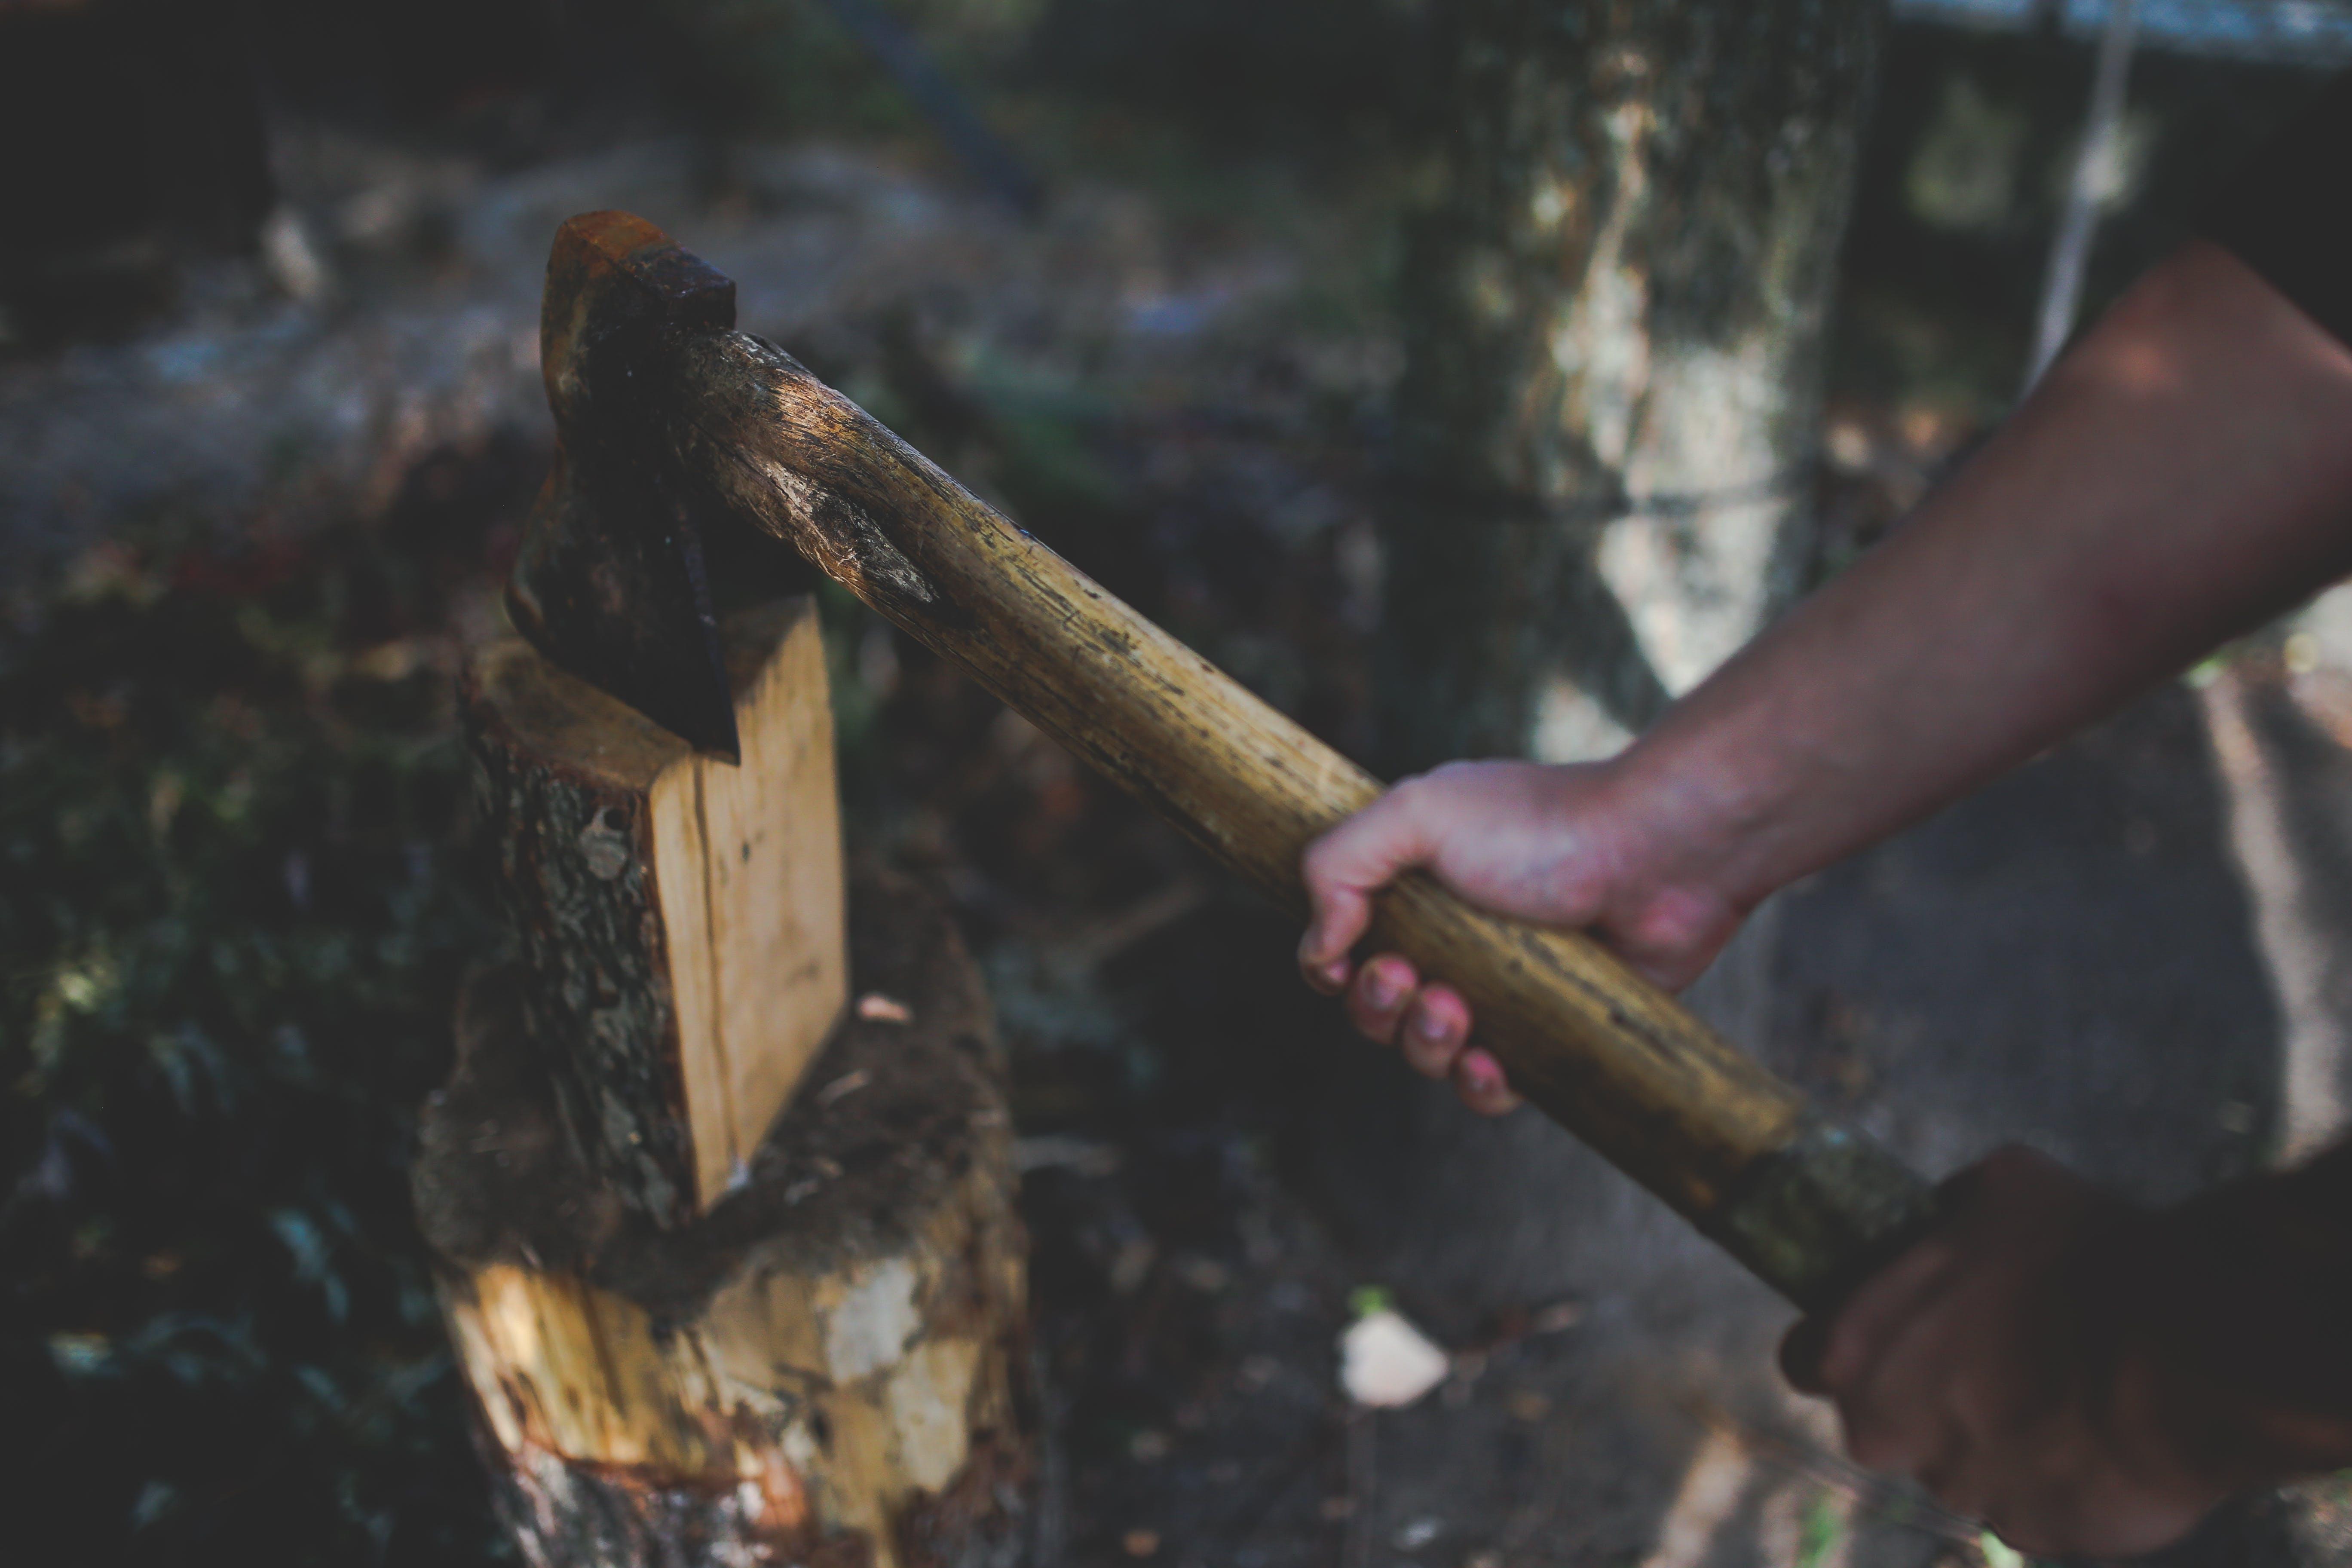 A man holds an old, worn axe